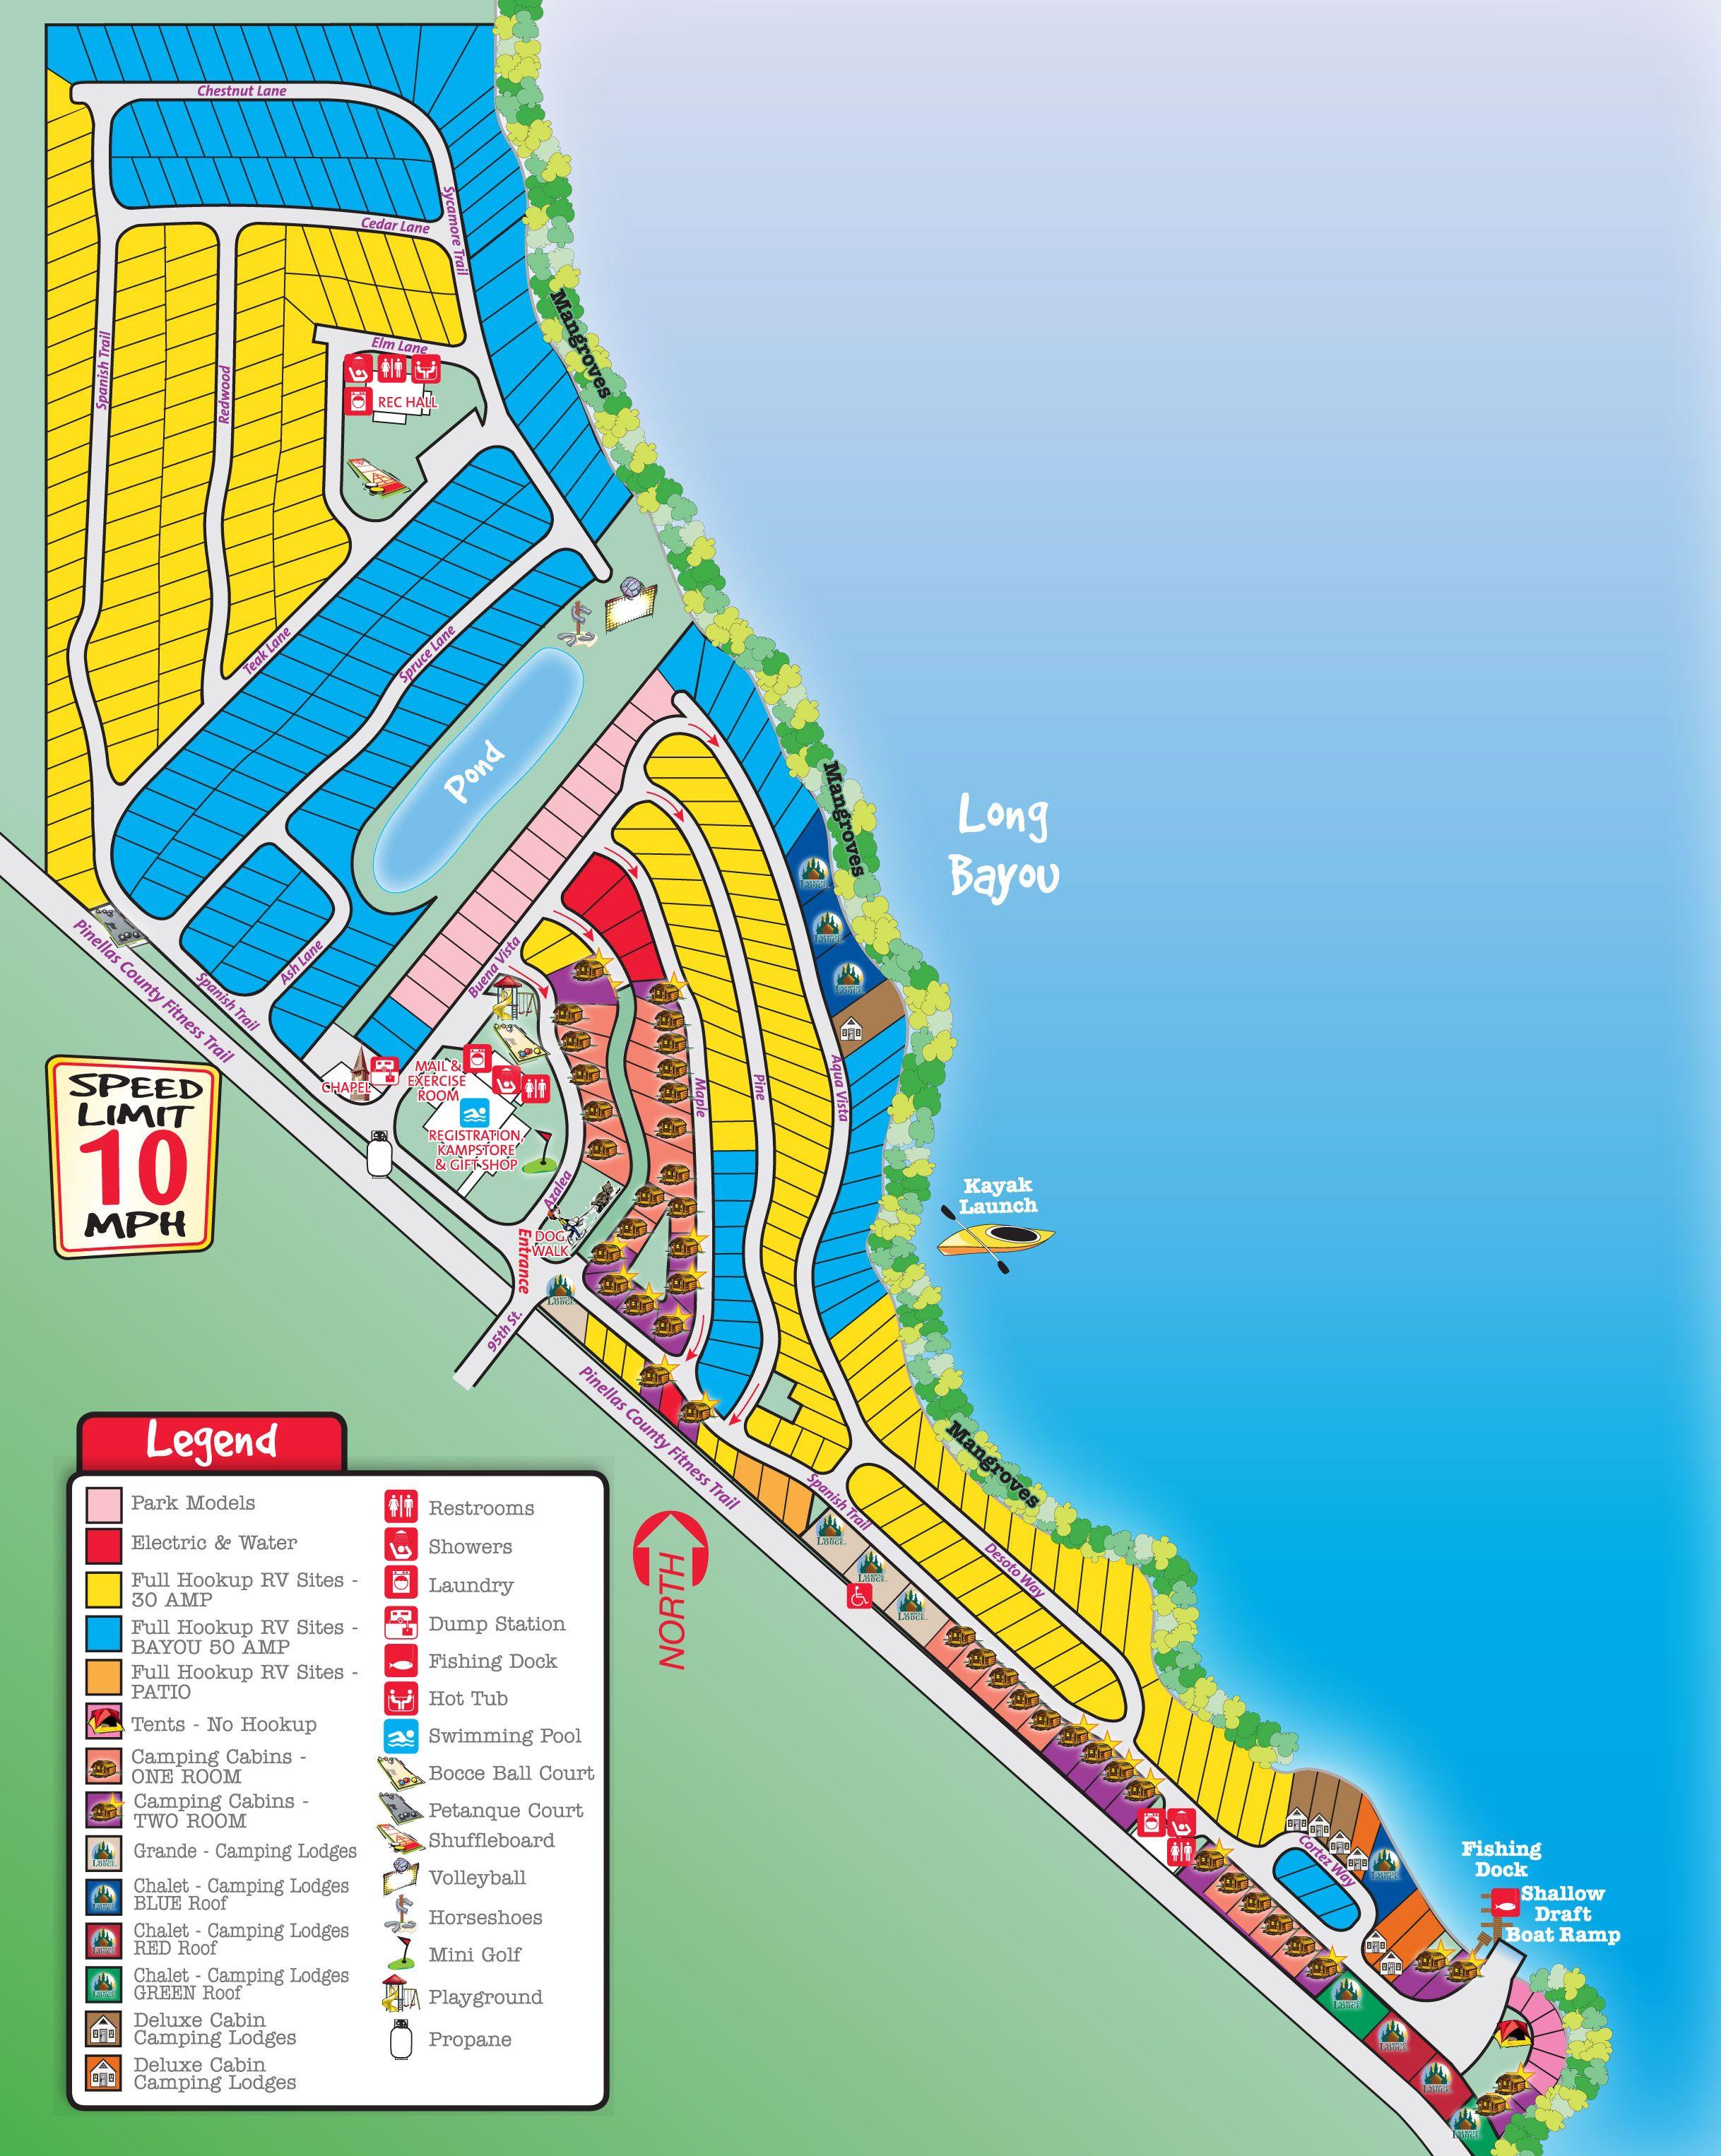 St. Petersburg / Madeira Beach Koa Campsites Start At $51.50 Per - Map Of Koa Campgrounds In Florida